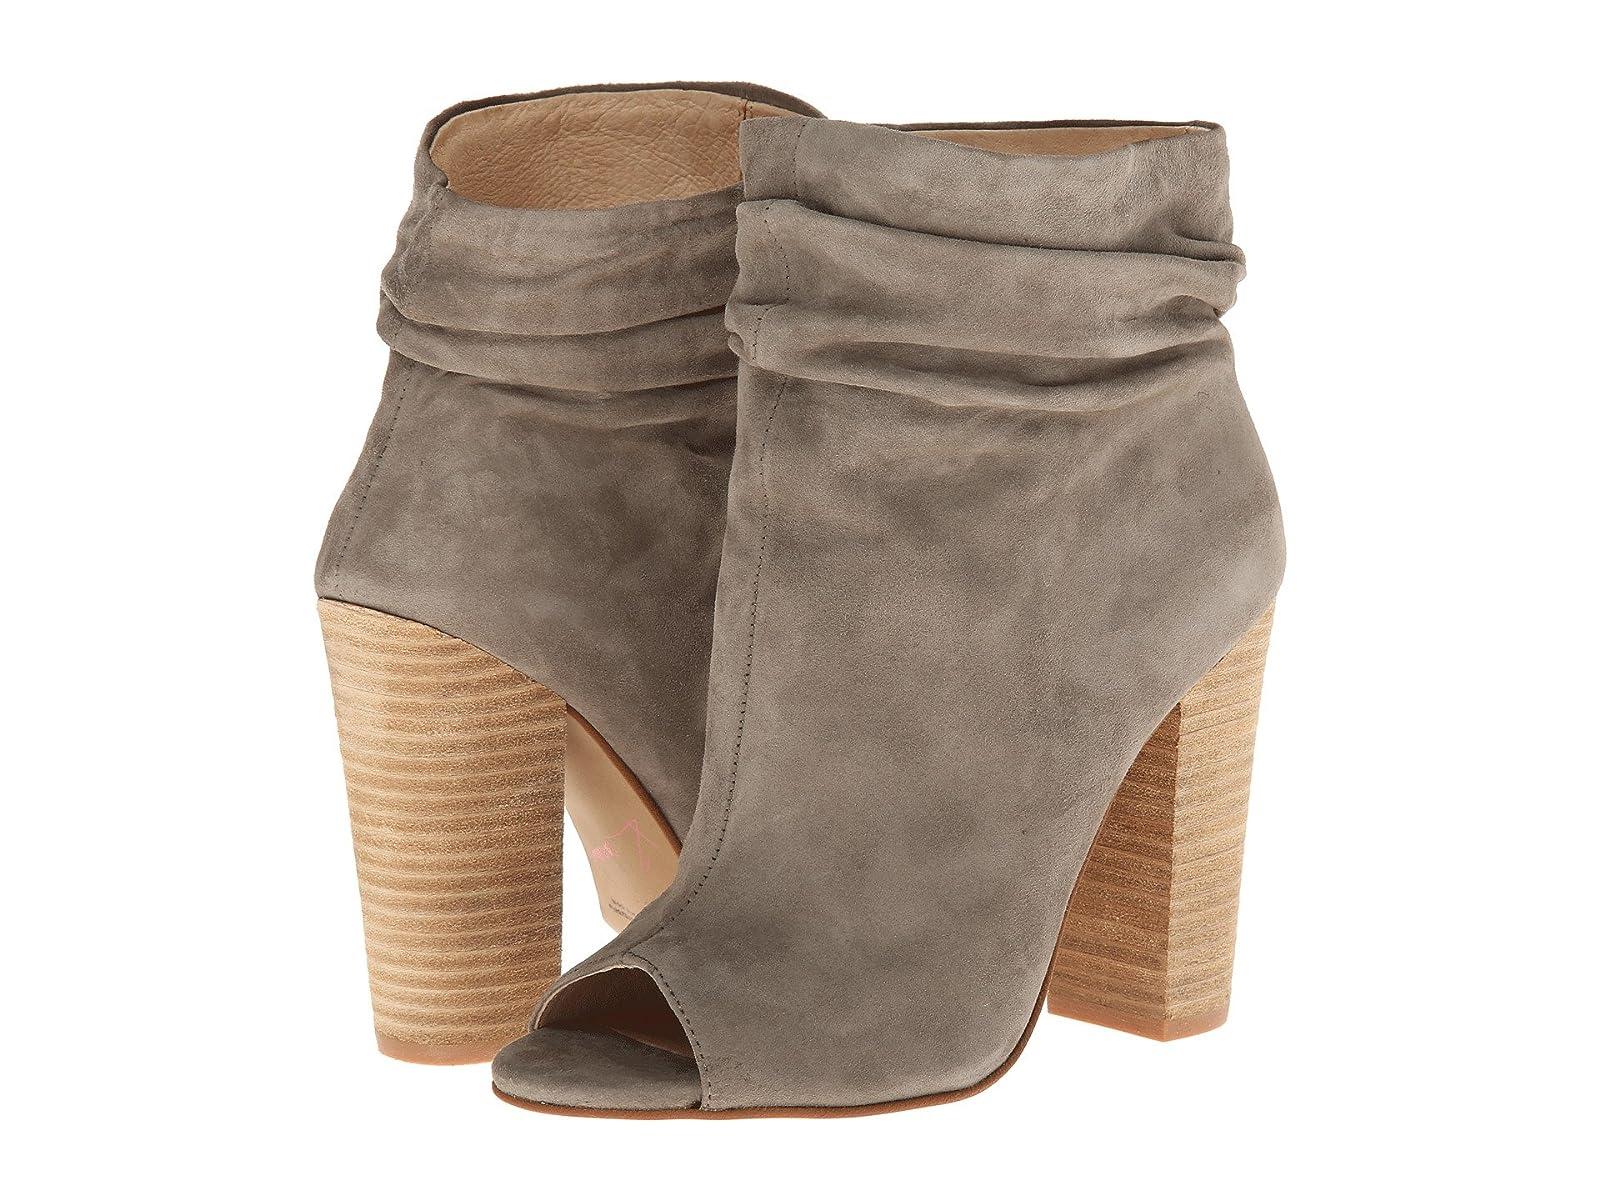 Kristin Cavallari Laurel Peep Toe BootieAffordable and distinctive shoes